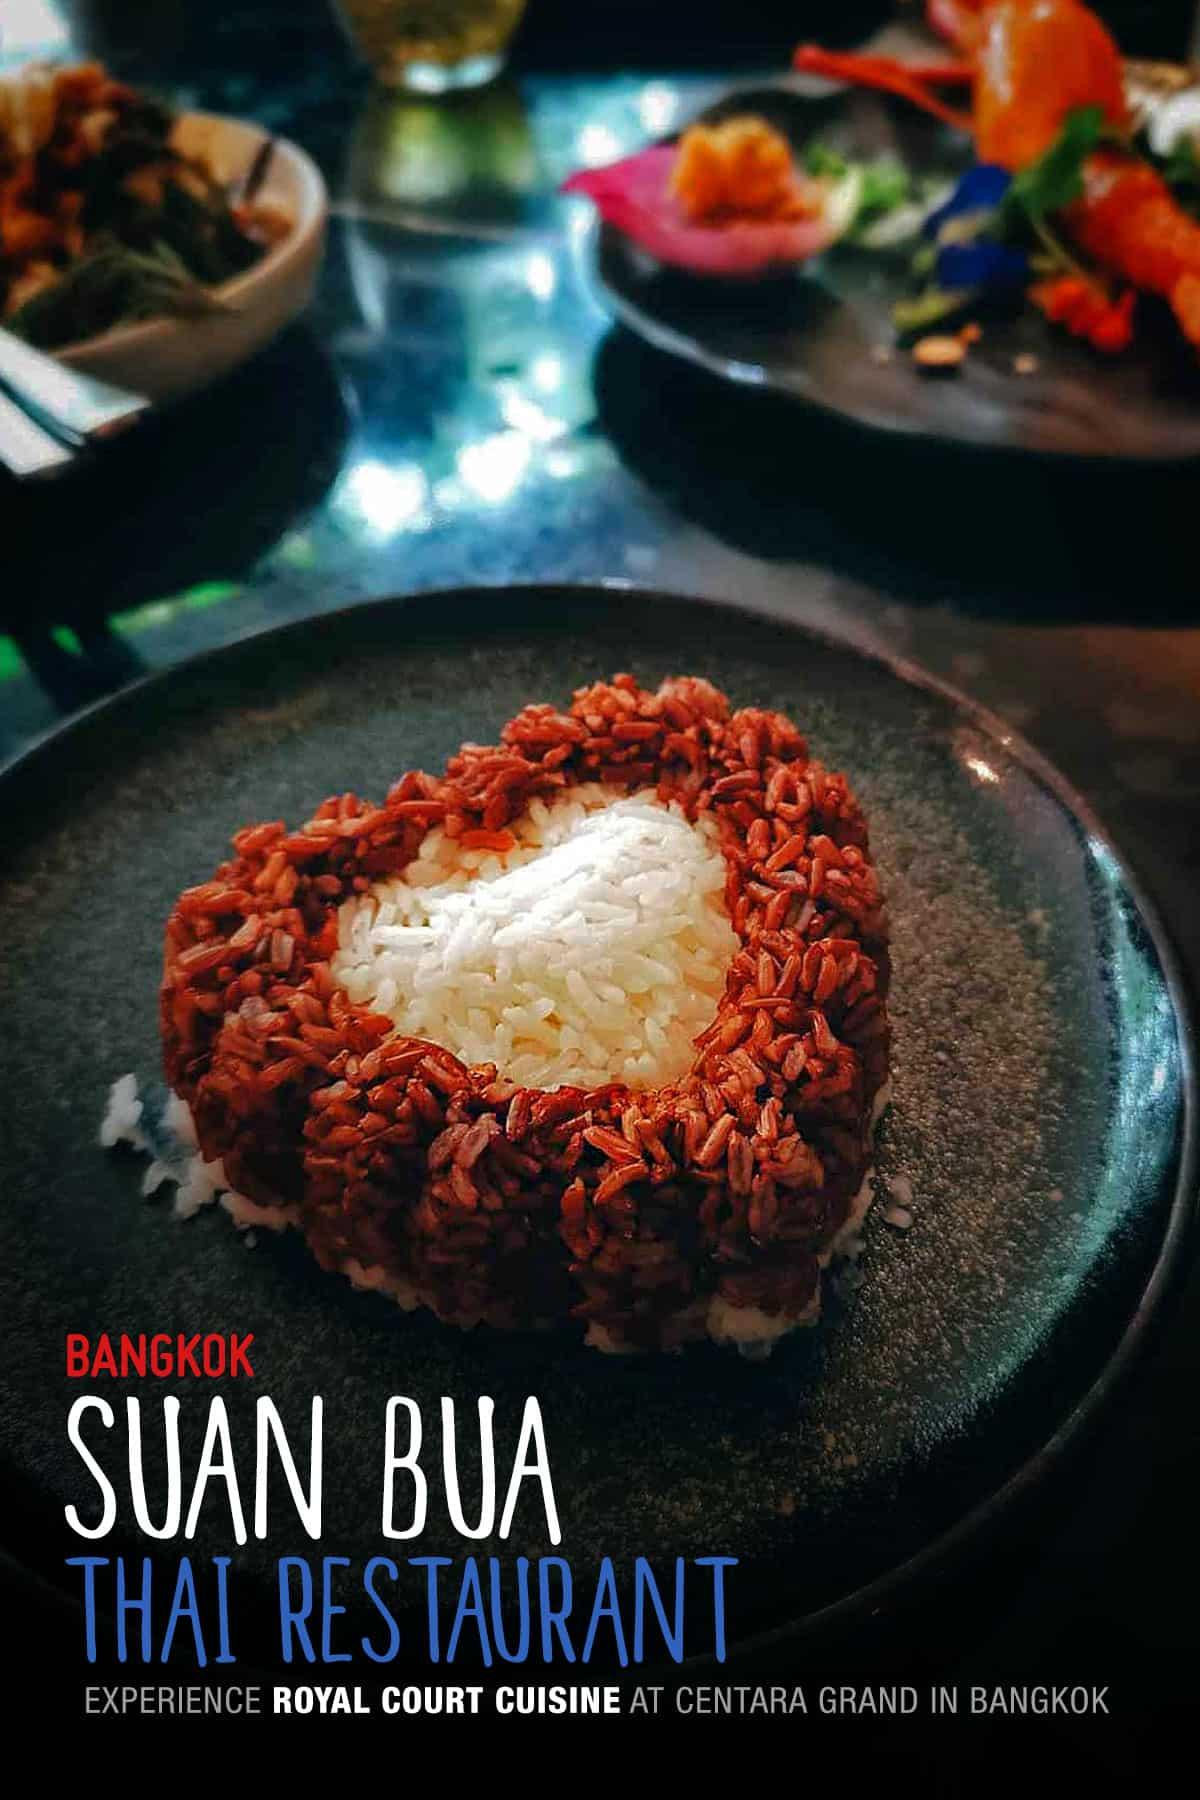 Suan Bua Thai Restaurant, Centara Grand, Bangkok, Thailand